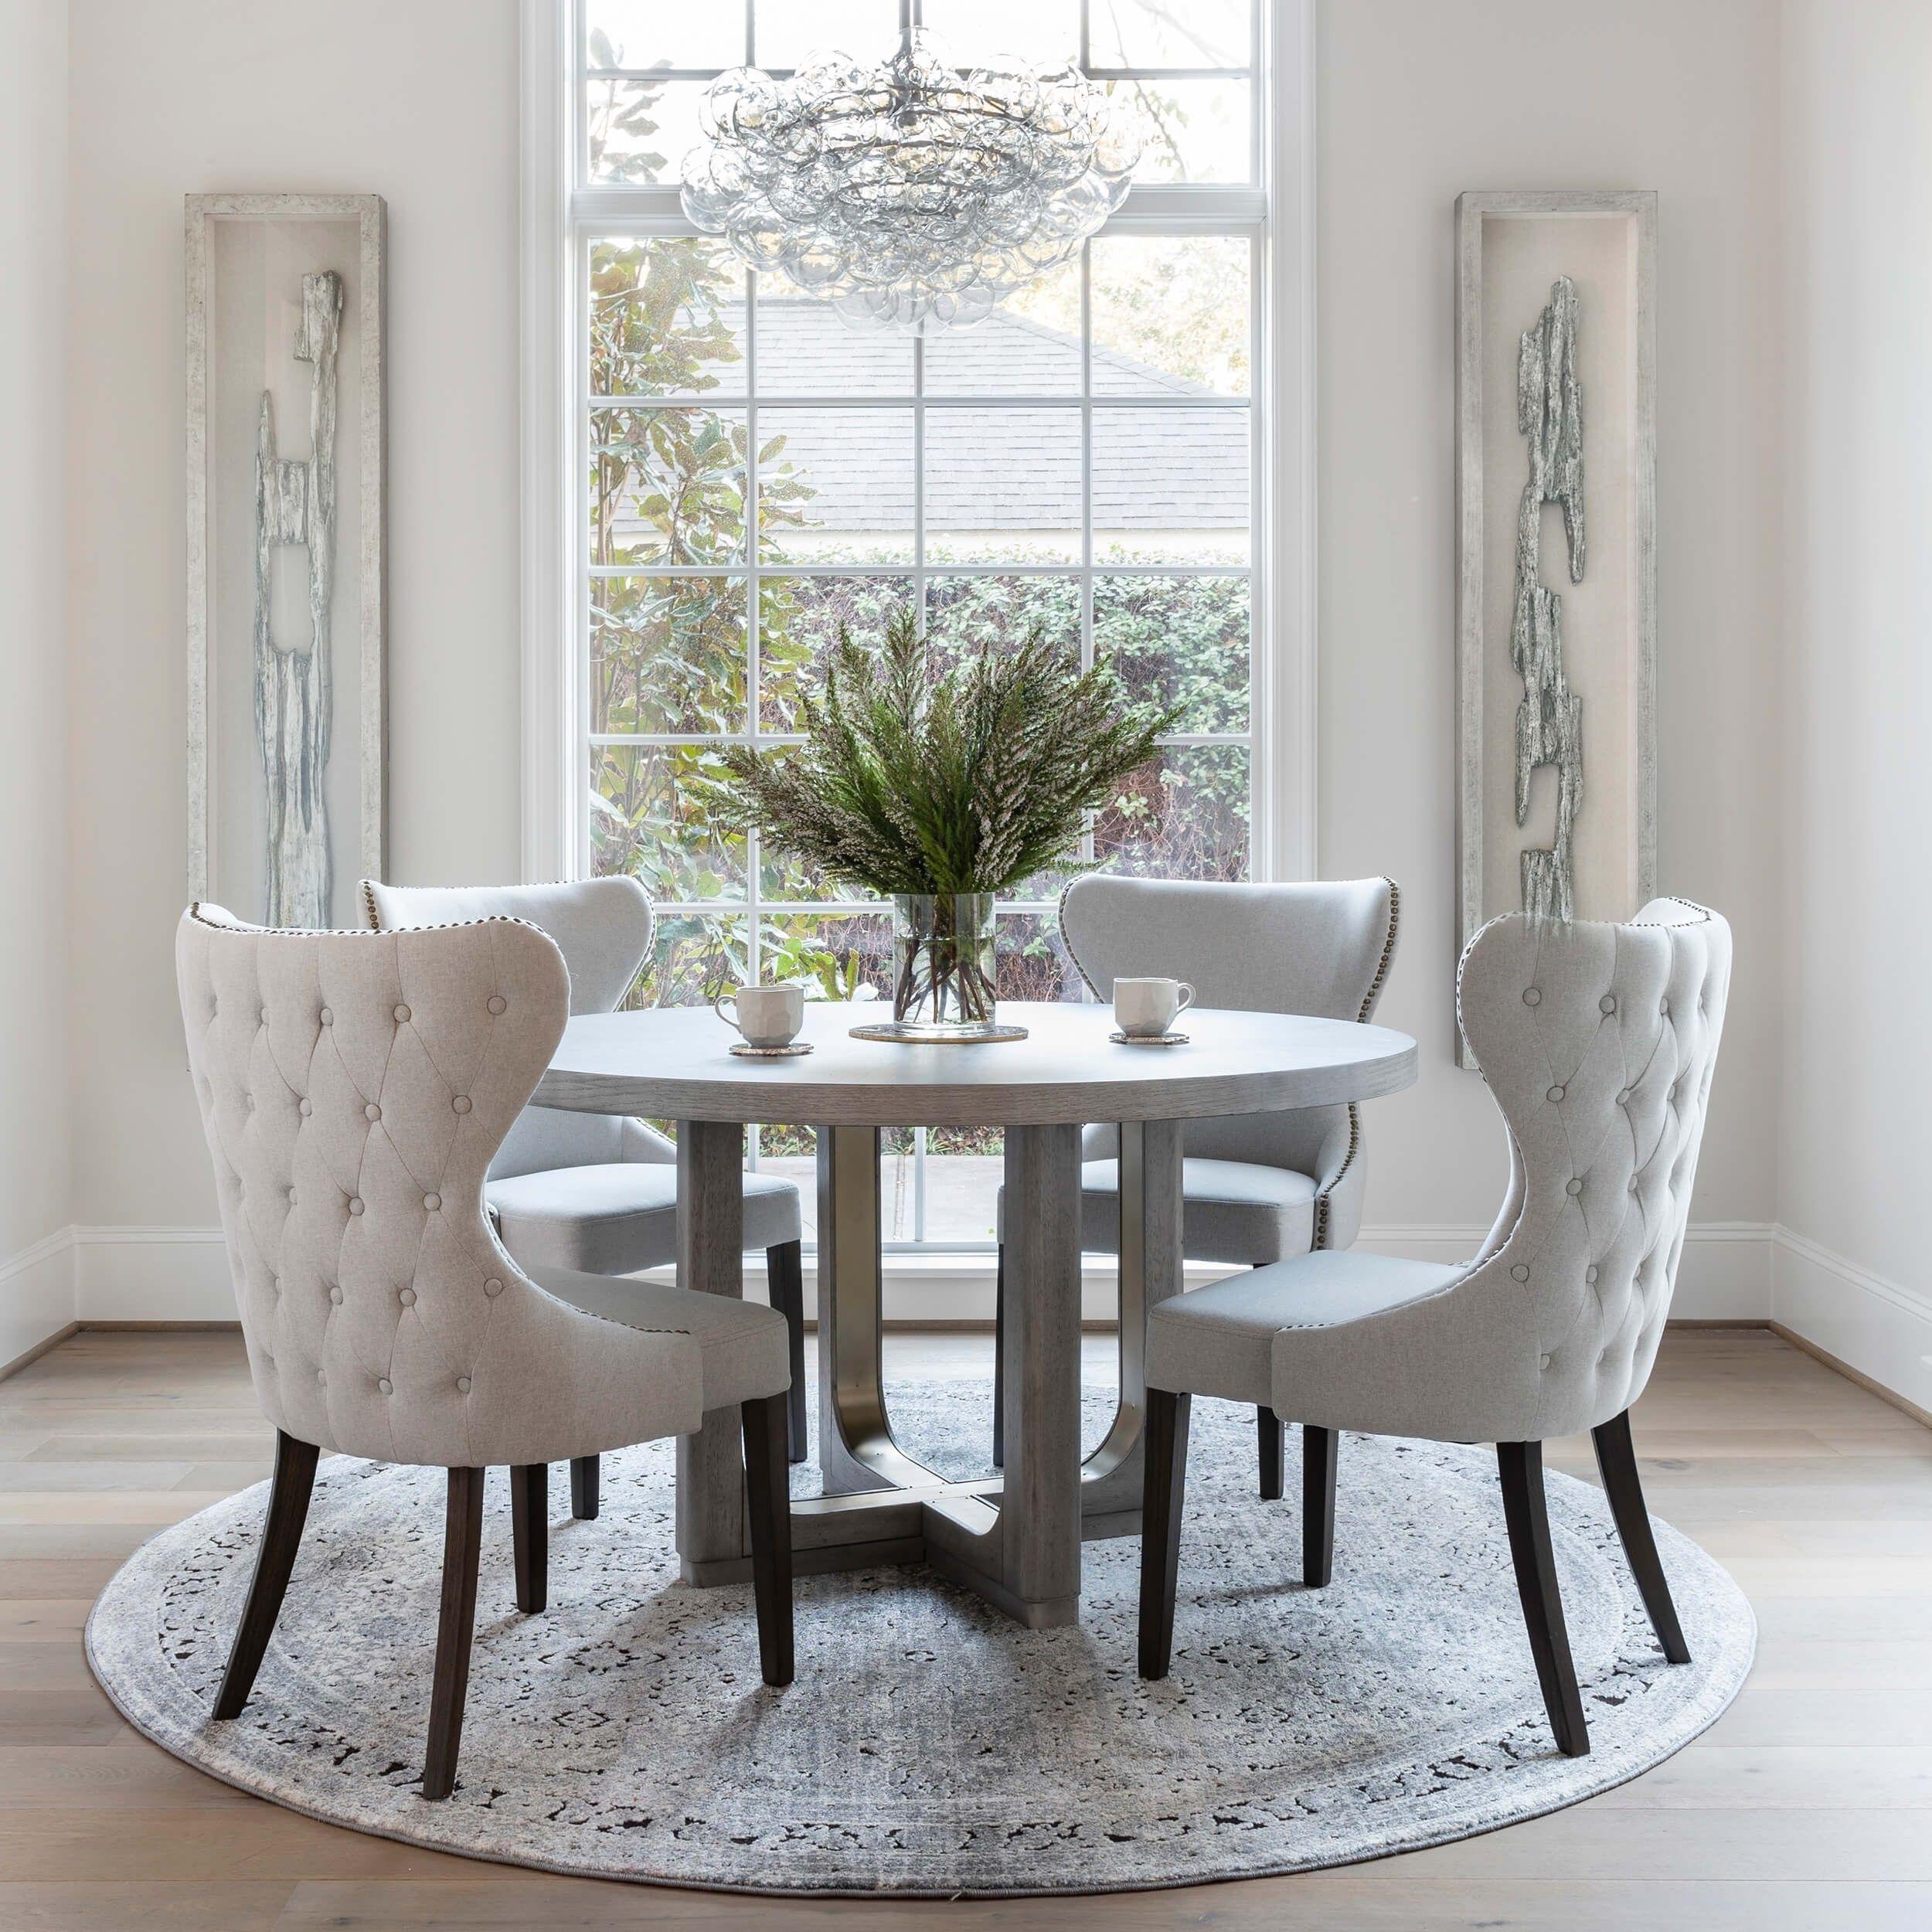 Loloi Rug Millennium Mv 02 Grey Charcoal Elegant Dining Room Luxury Dining Room Dining Room Small